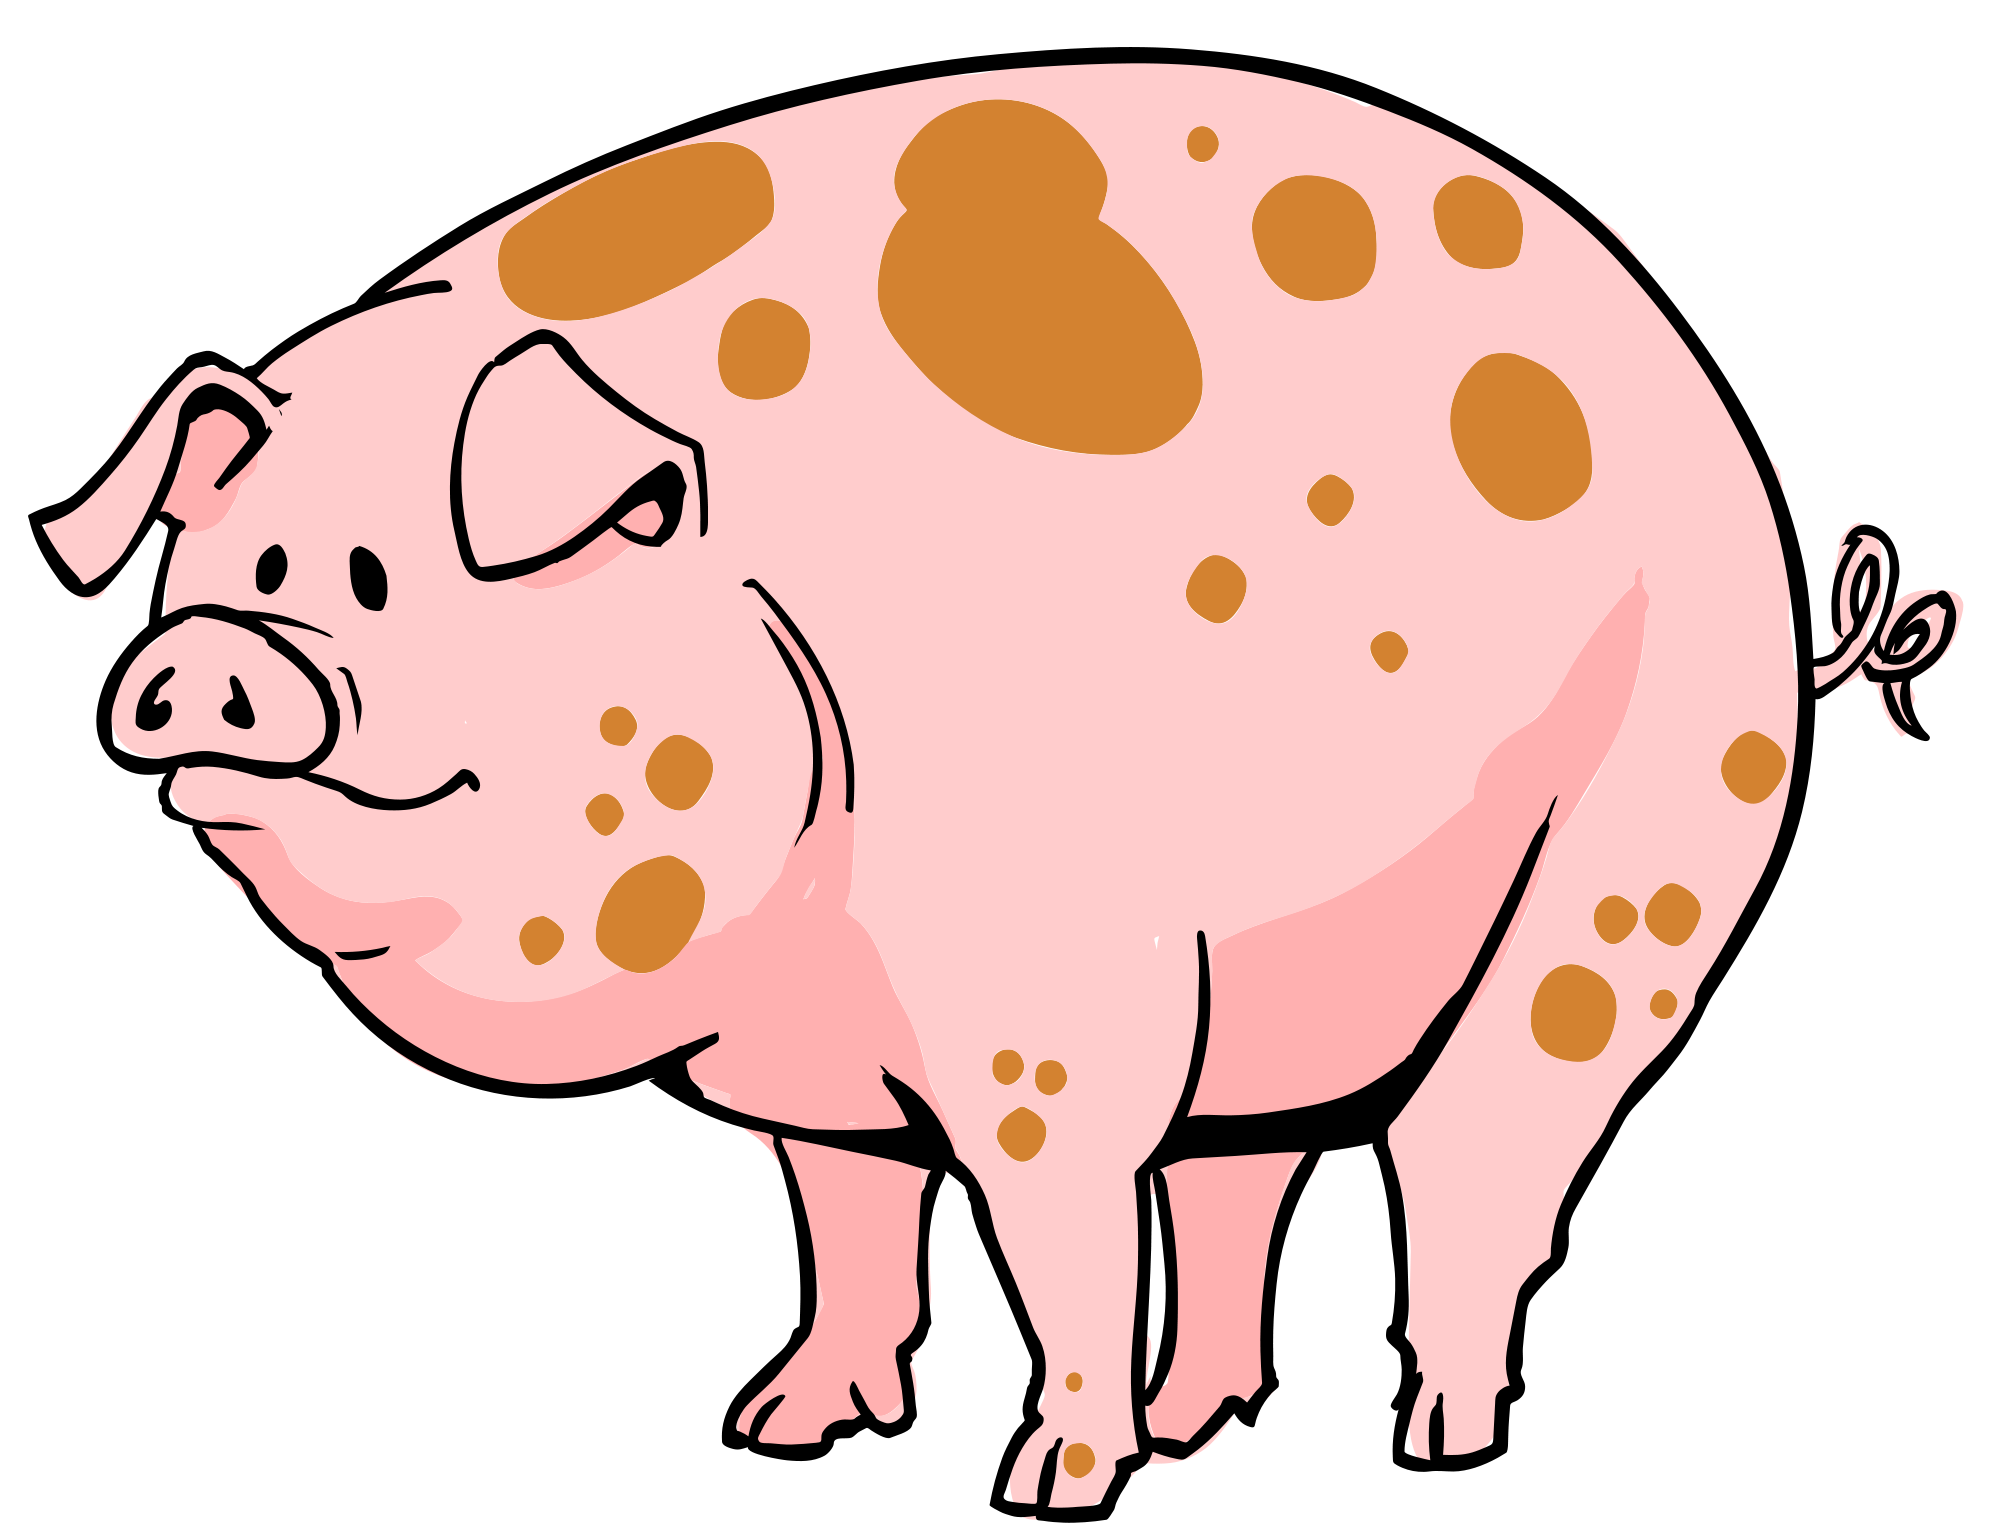 Pigs clipart farm animal, Pigs farm animal Transparent FREE.